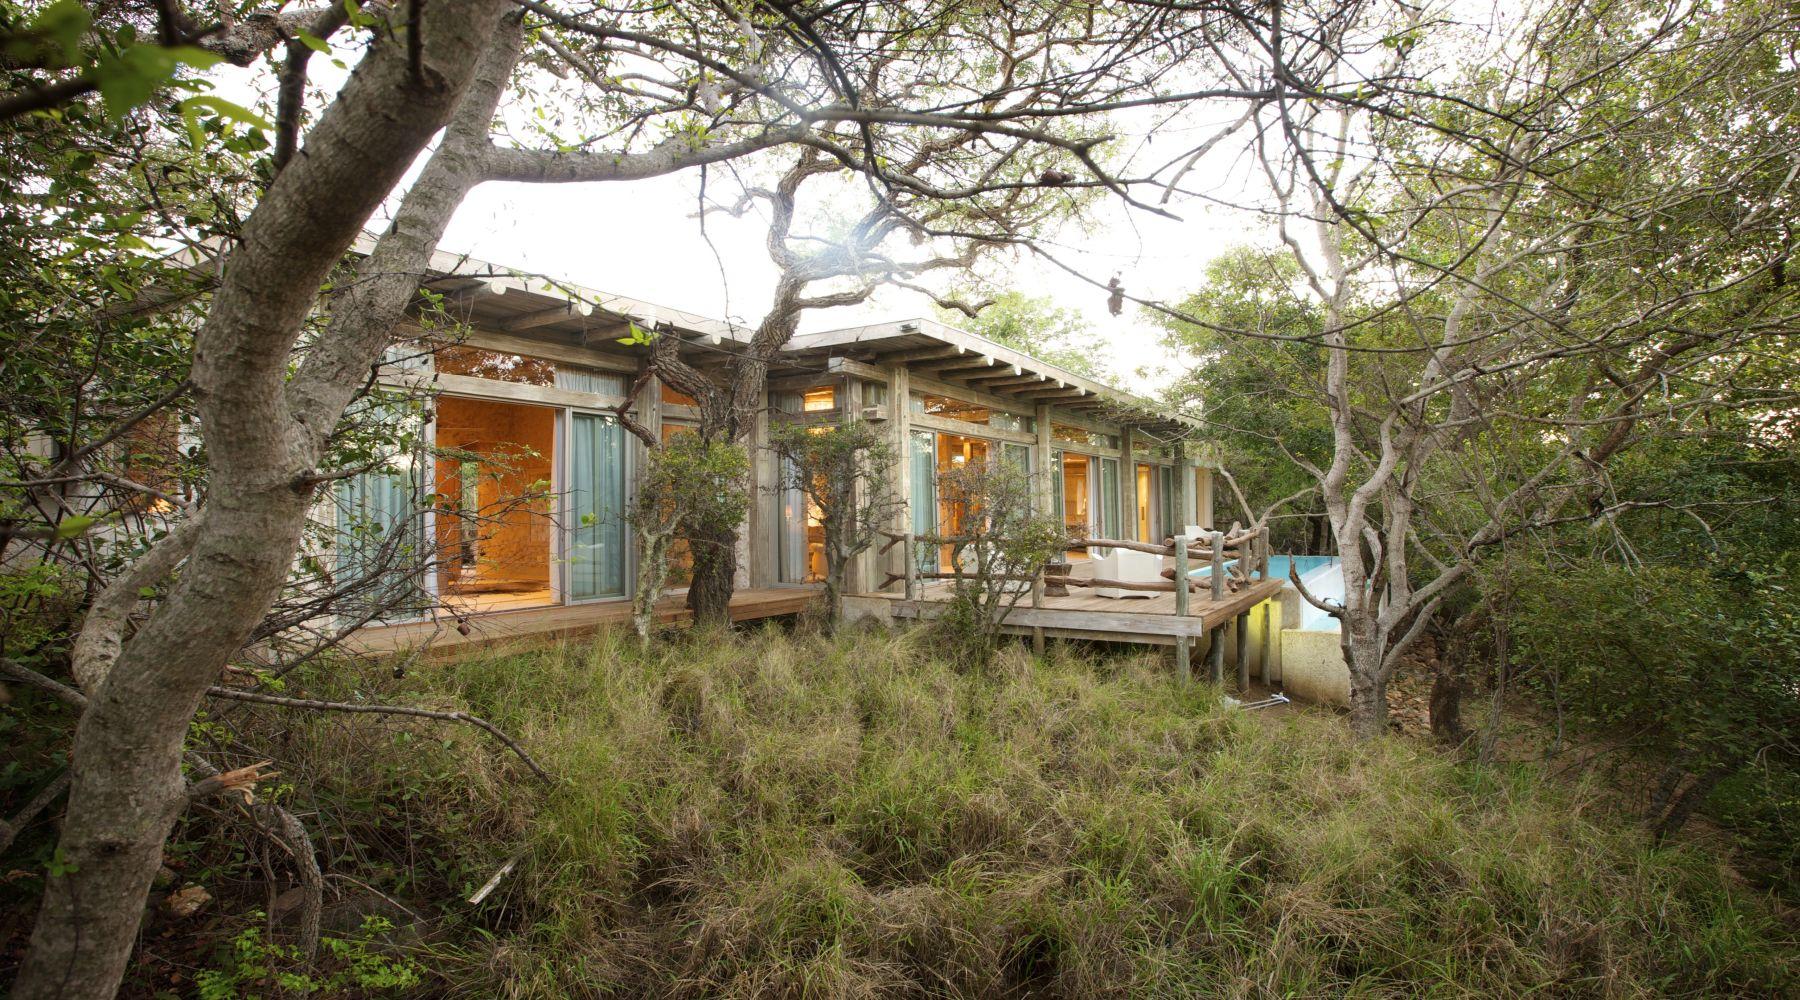 Kapama Karula Private Game Reserve